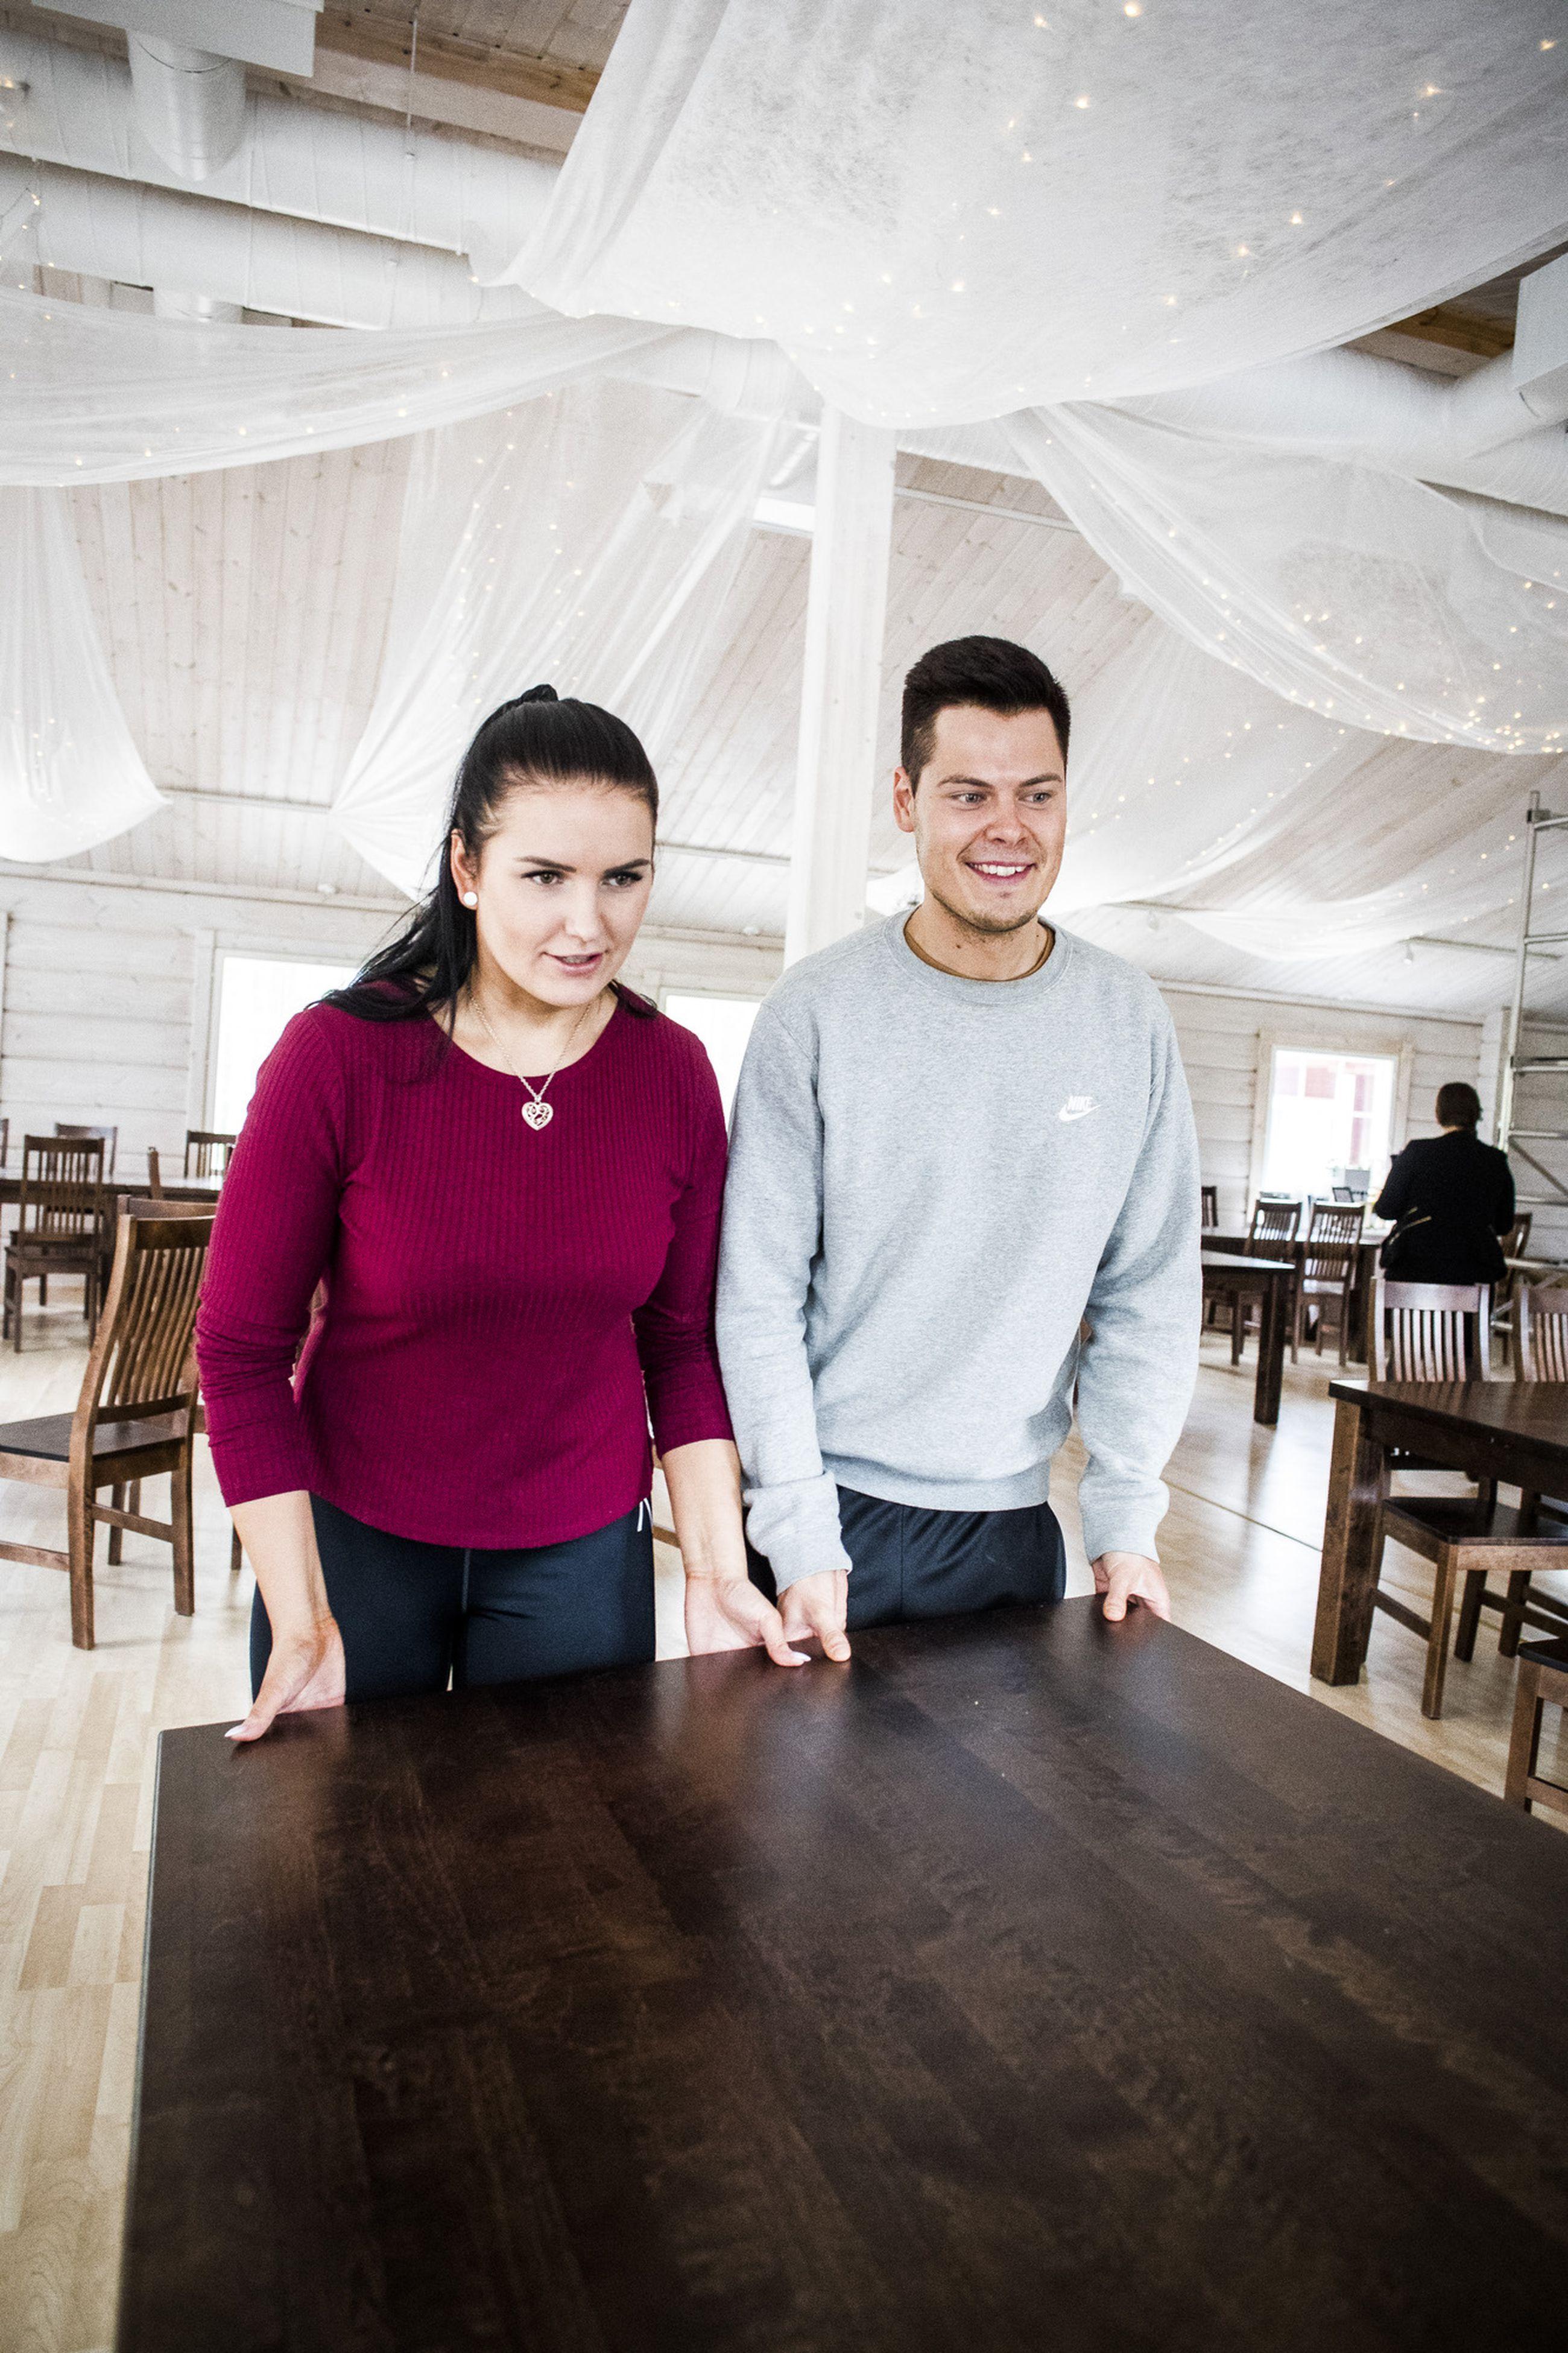 Hääpaikat Rovaniemi